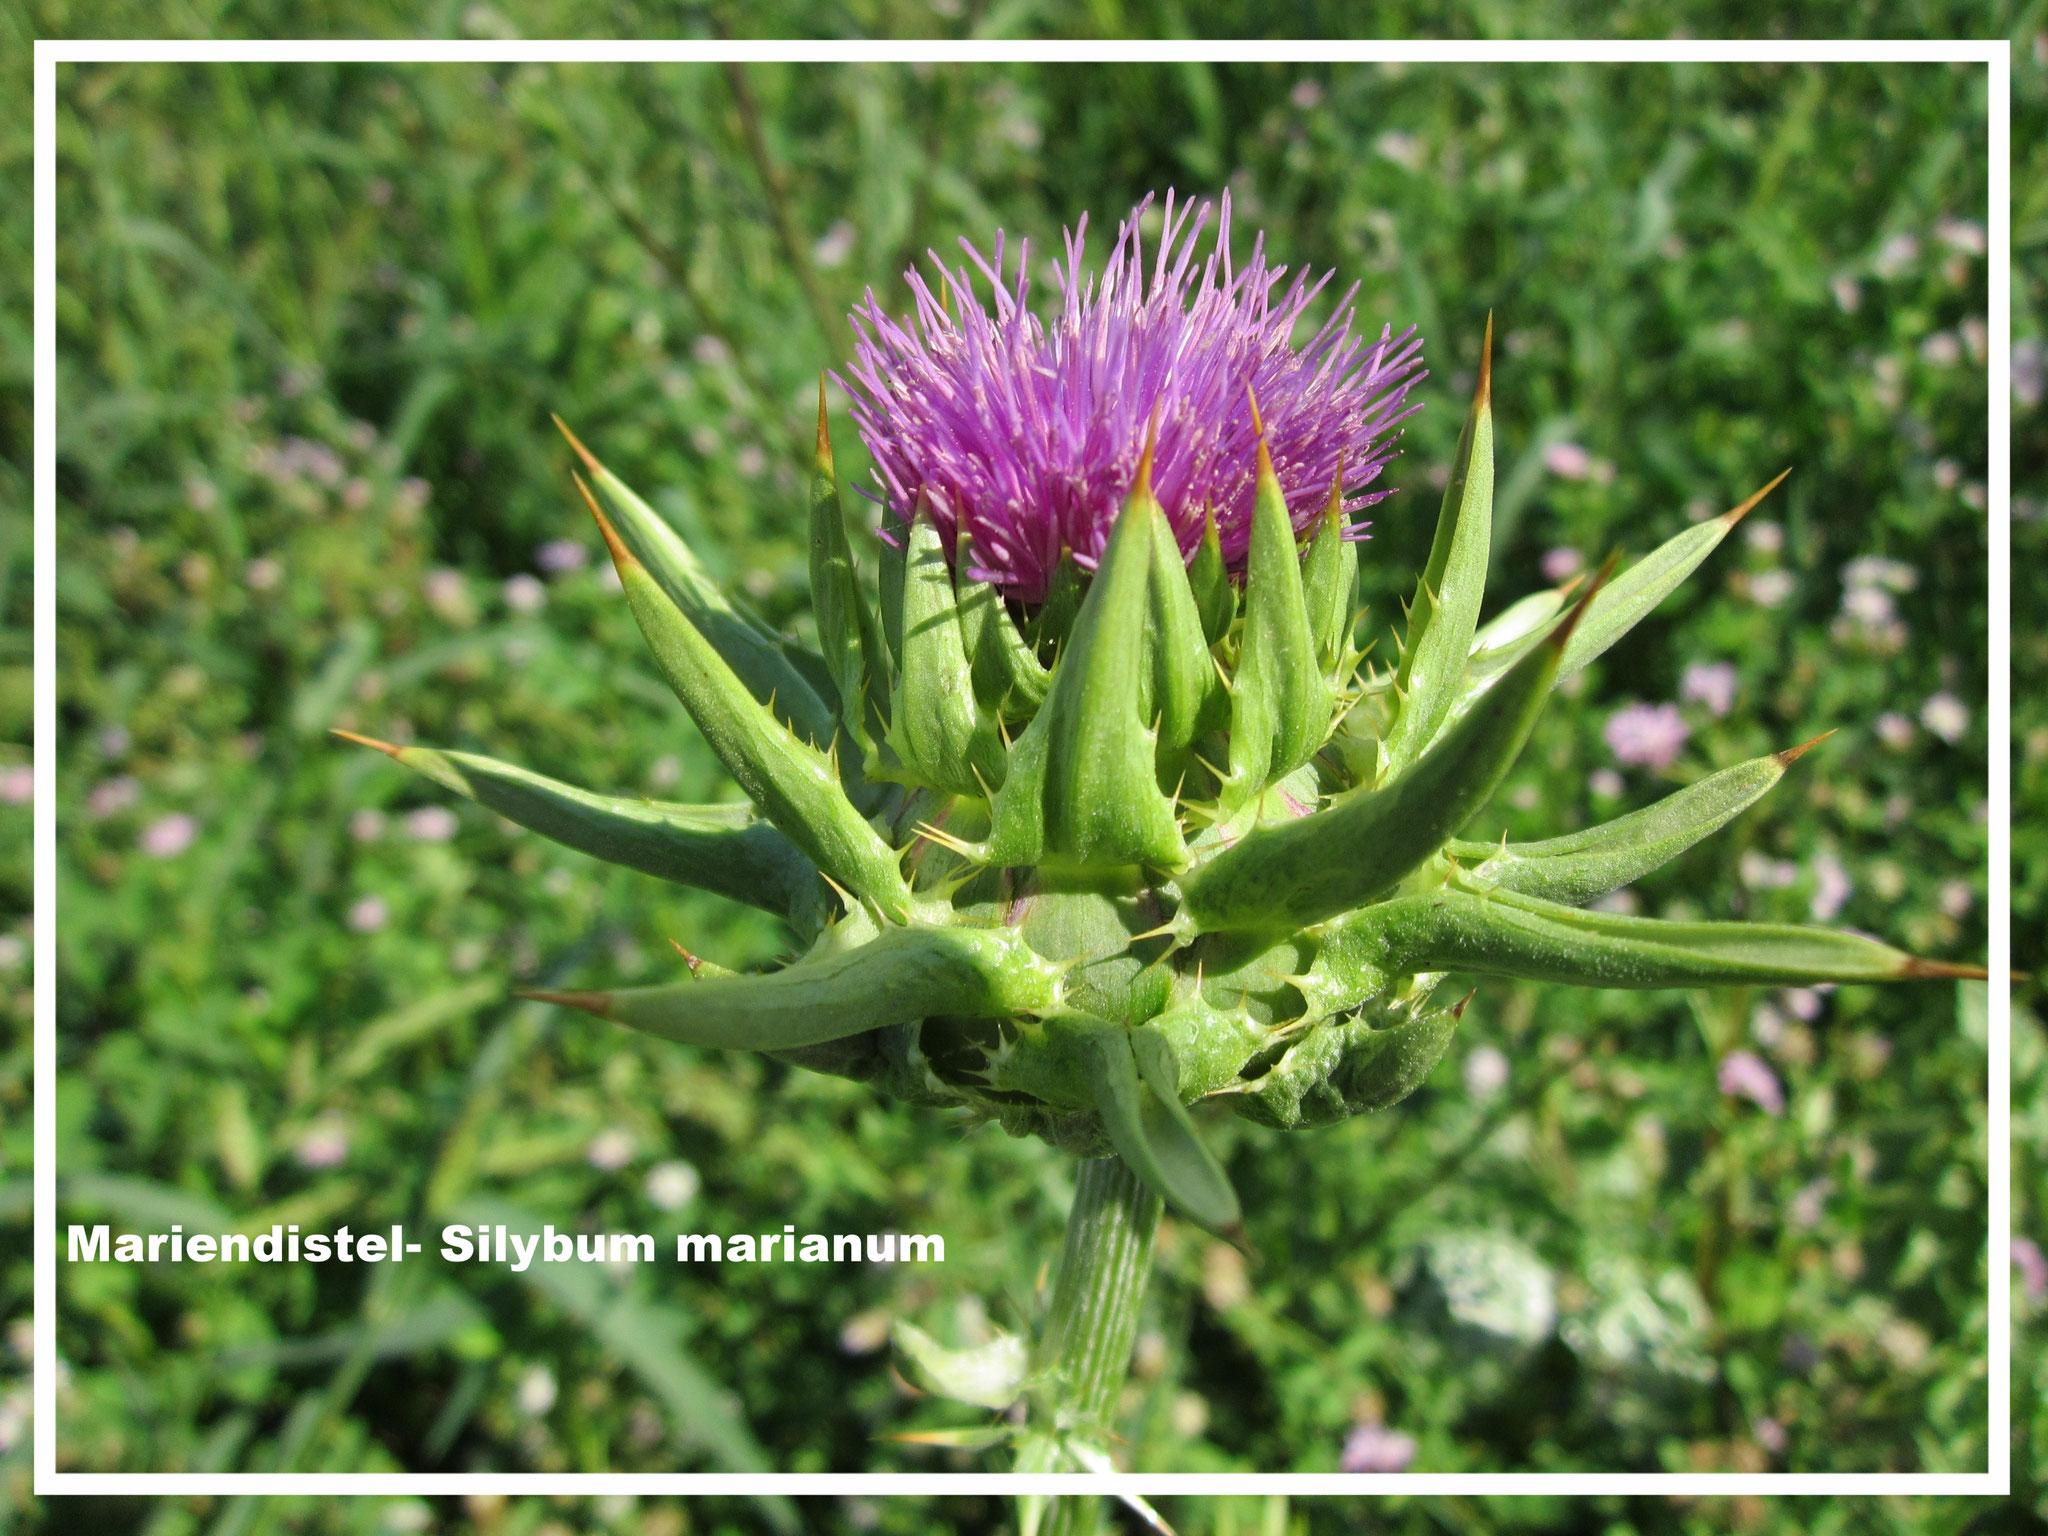 Marinedistel Pflanze- Silybum marianum